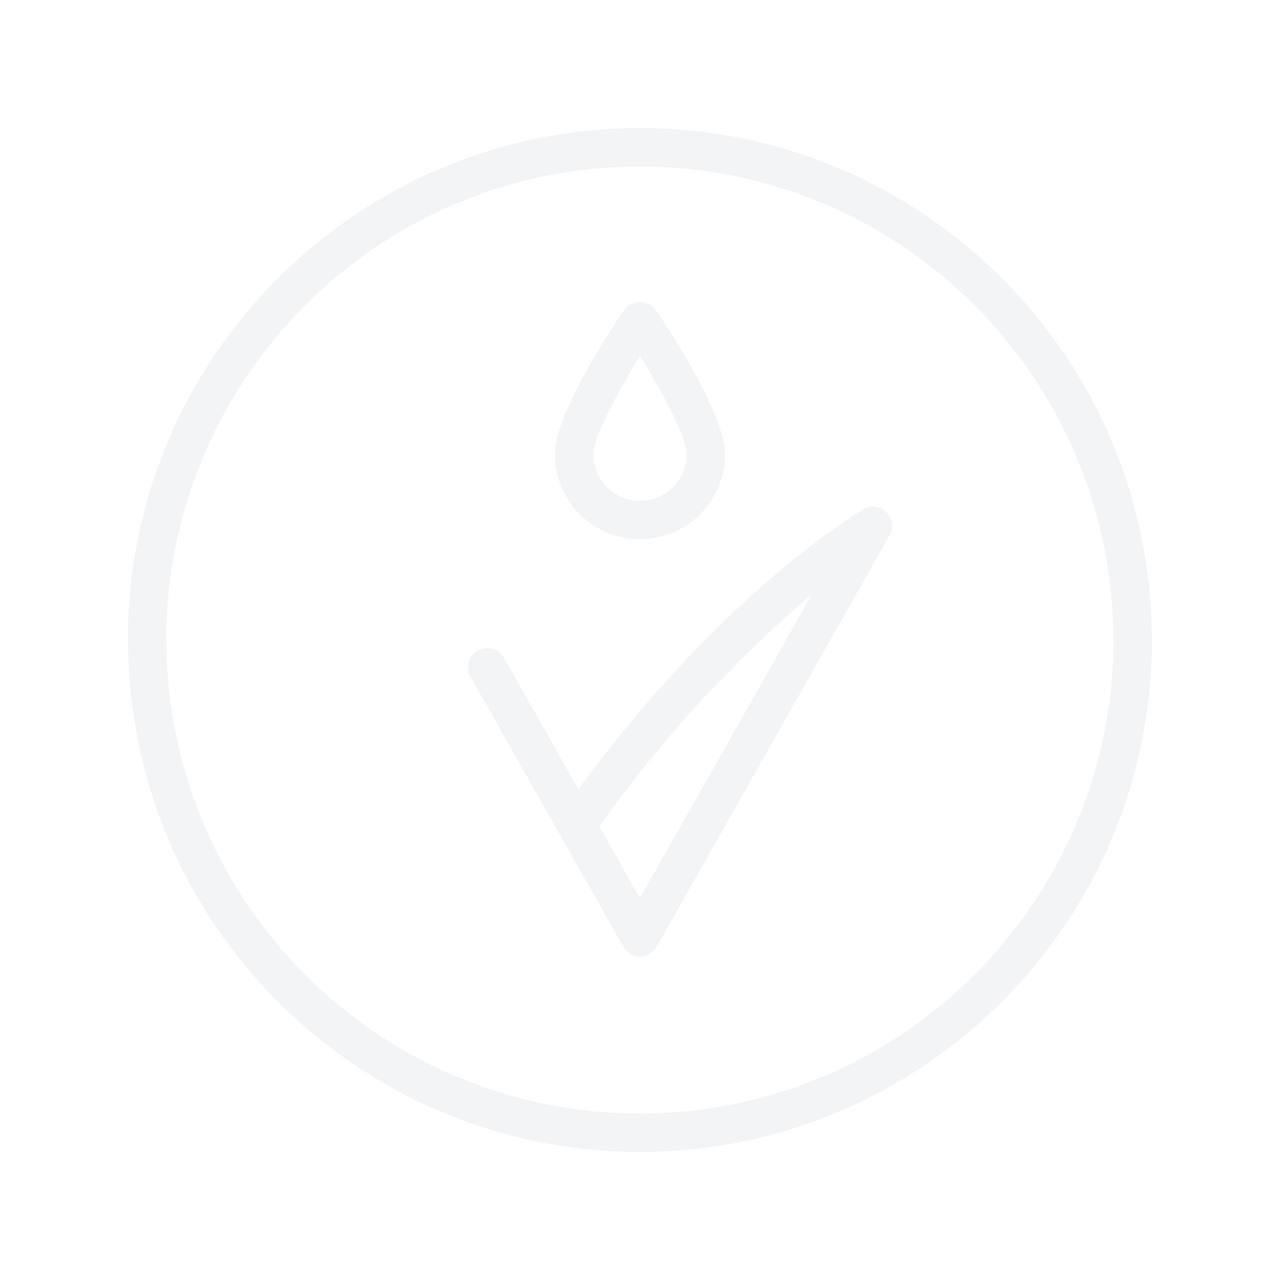 Natura Siberica Taiga Daily Protection Hand Cream 75ml